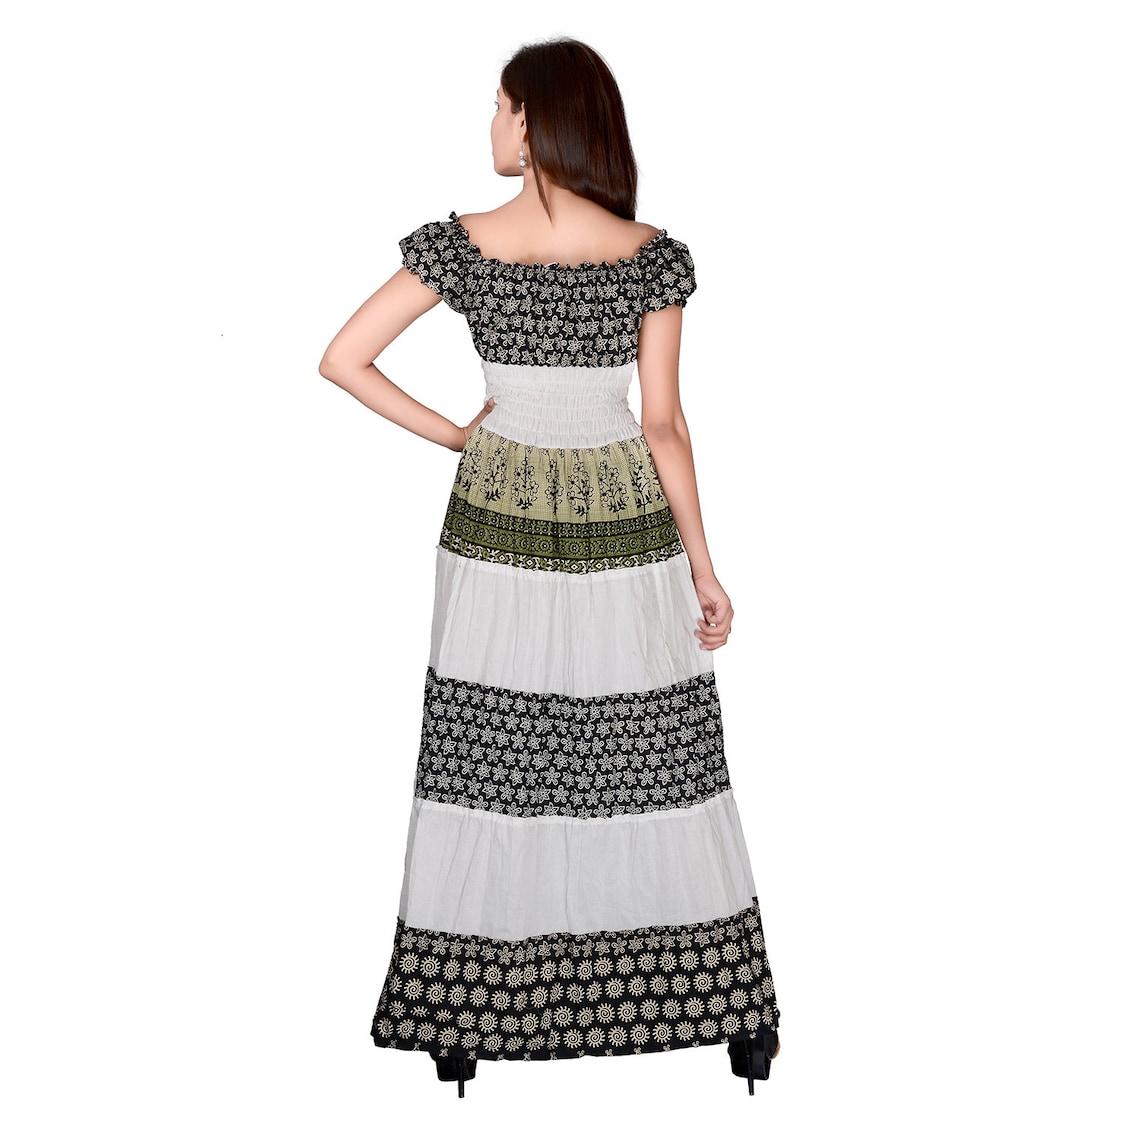 One piece printed dress maxi dress square neck women dress